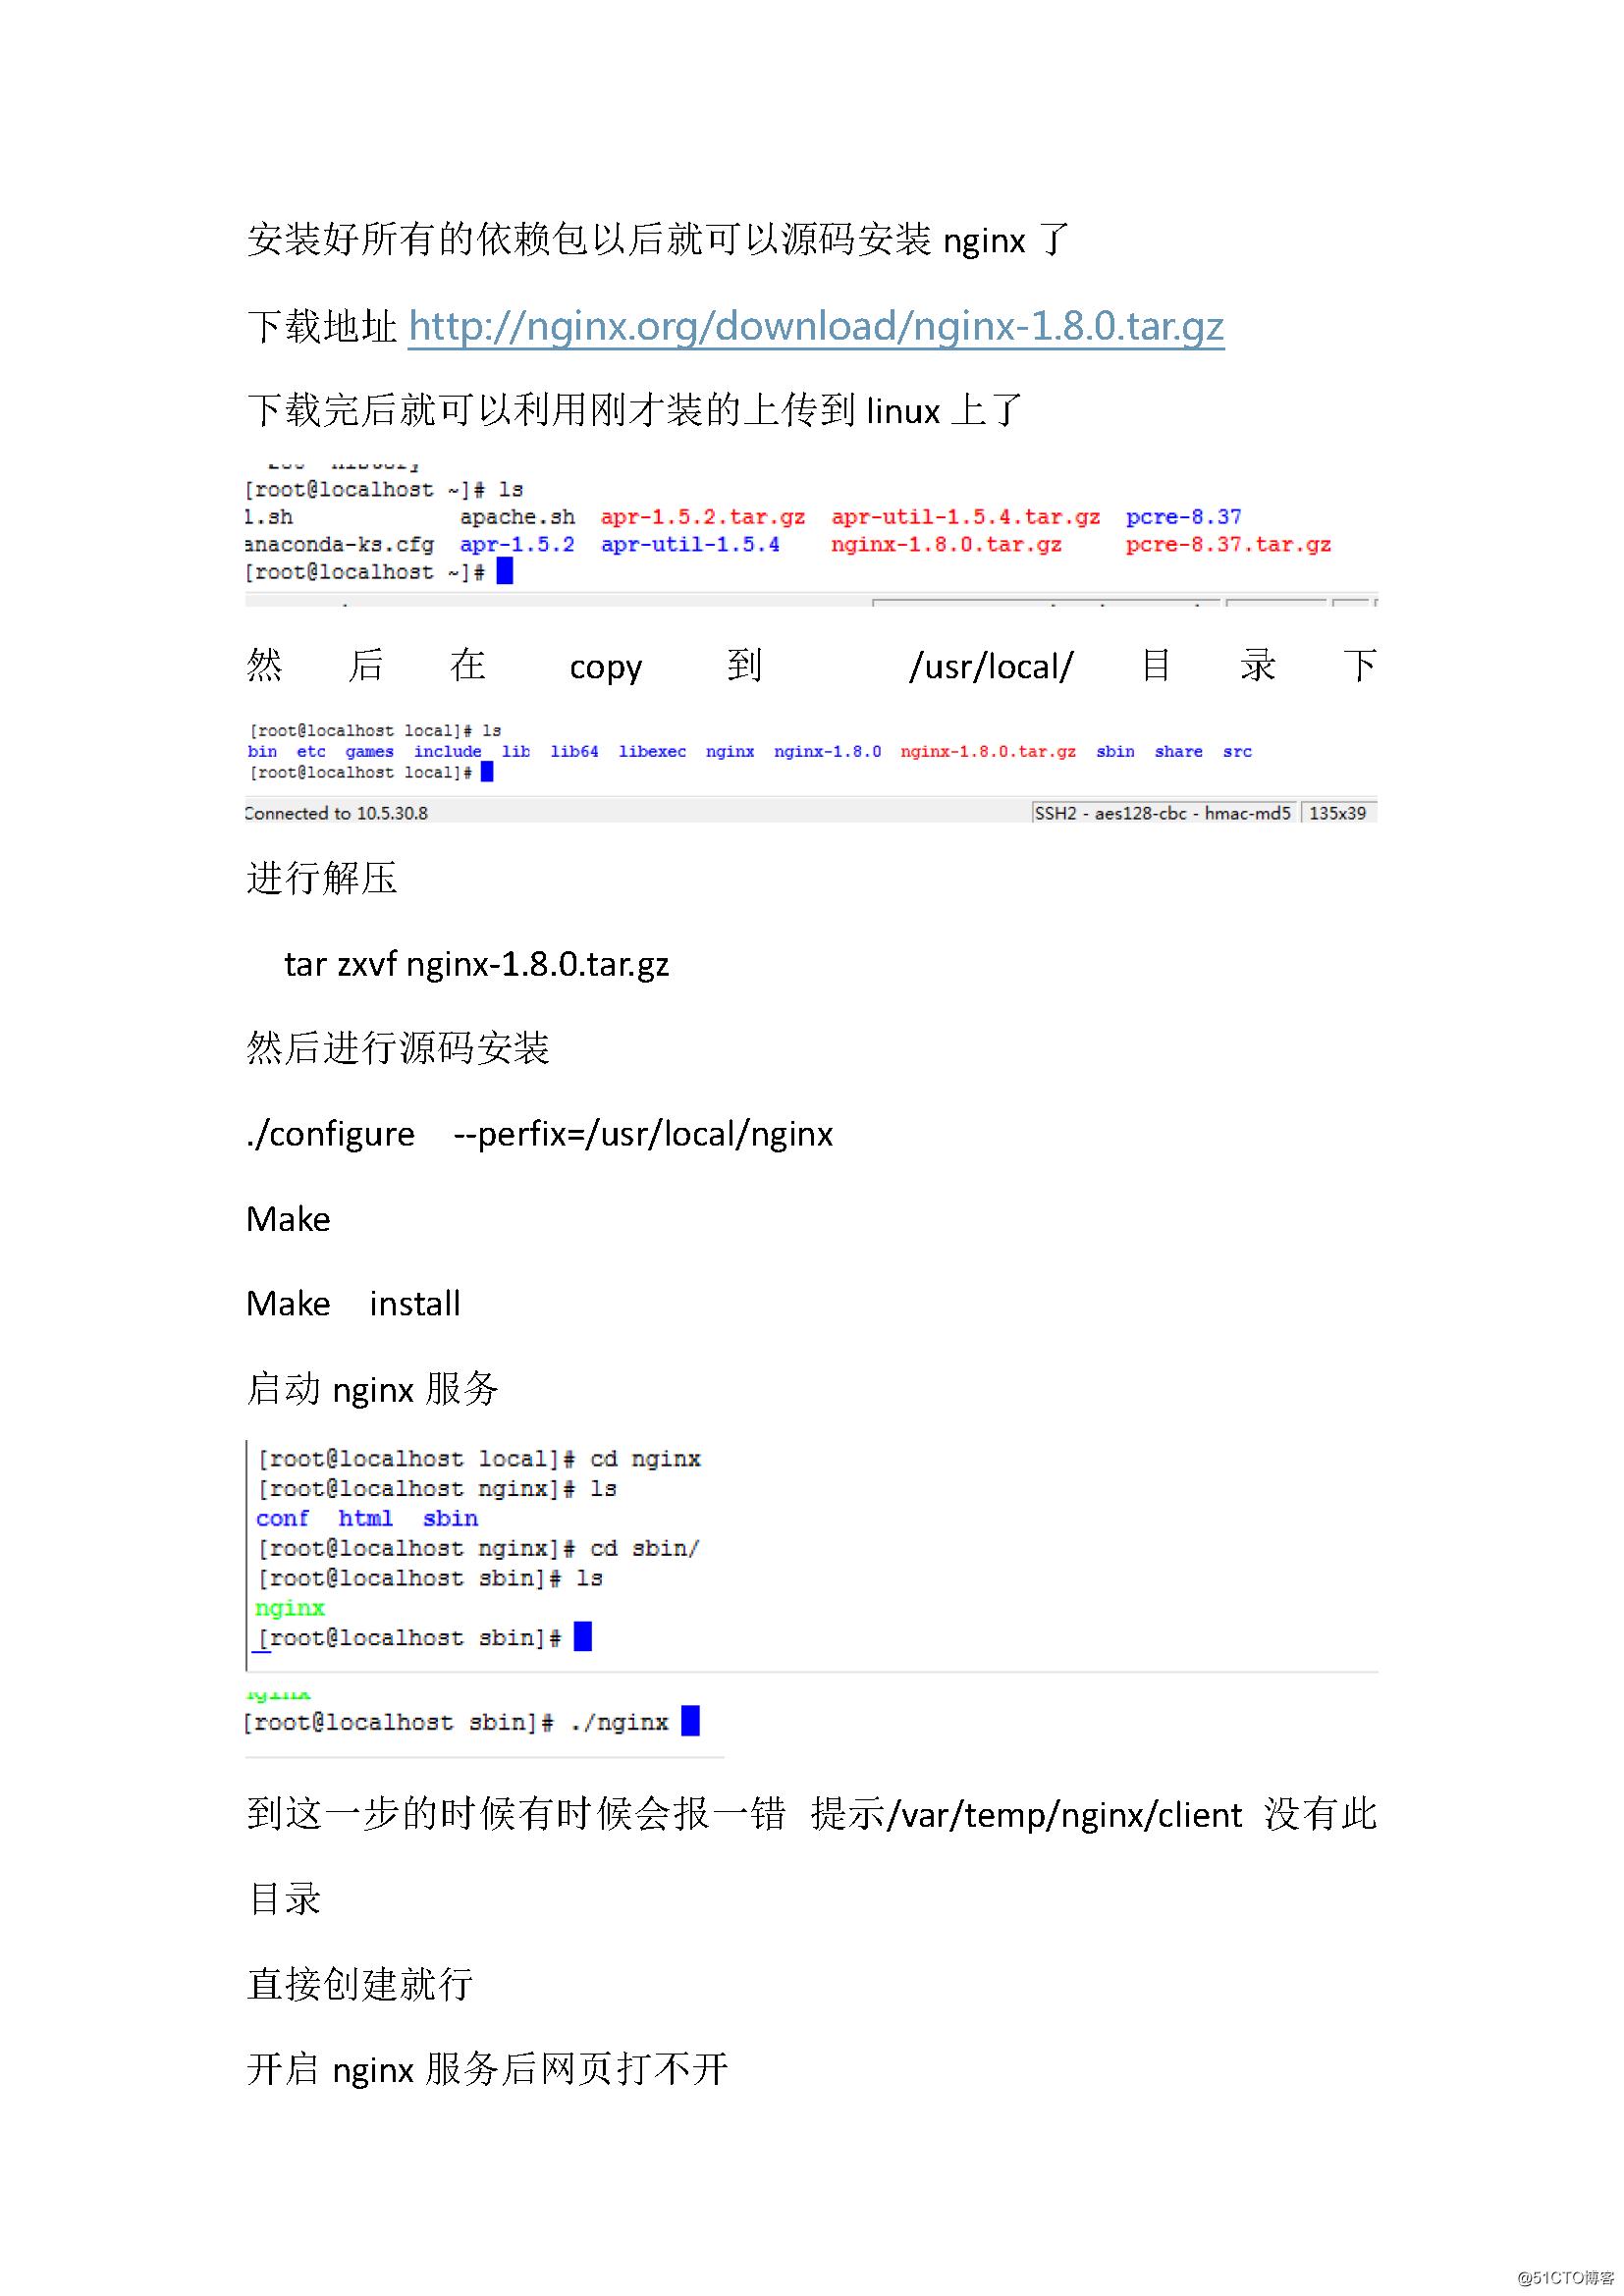 搭建nginx服务器_页面_2.png